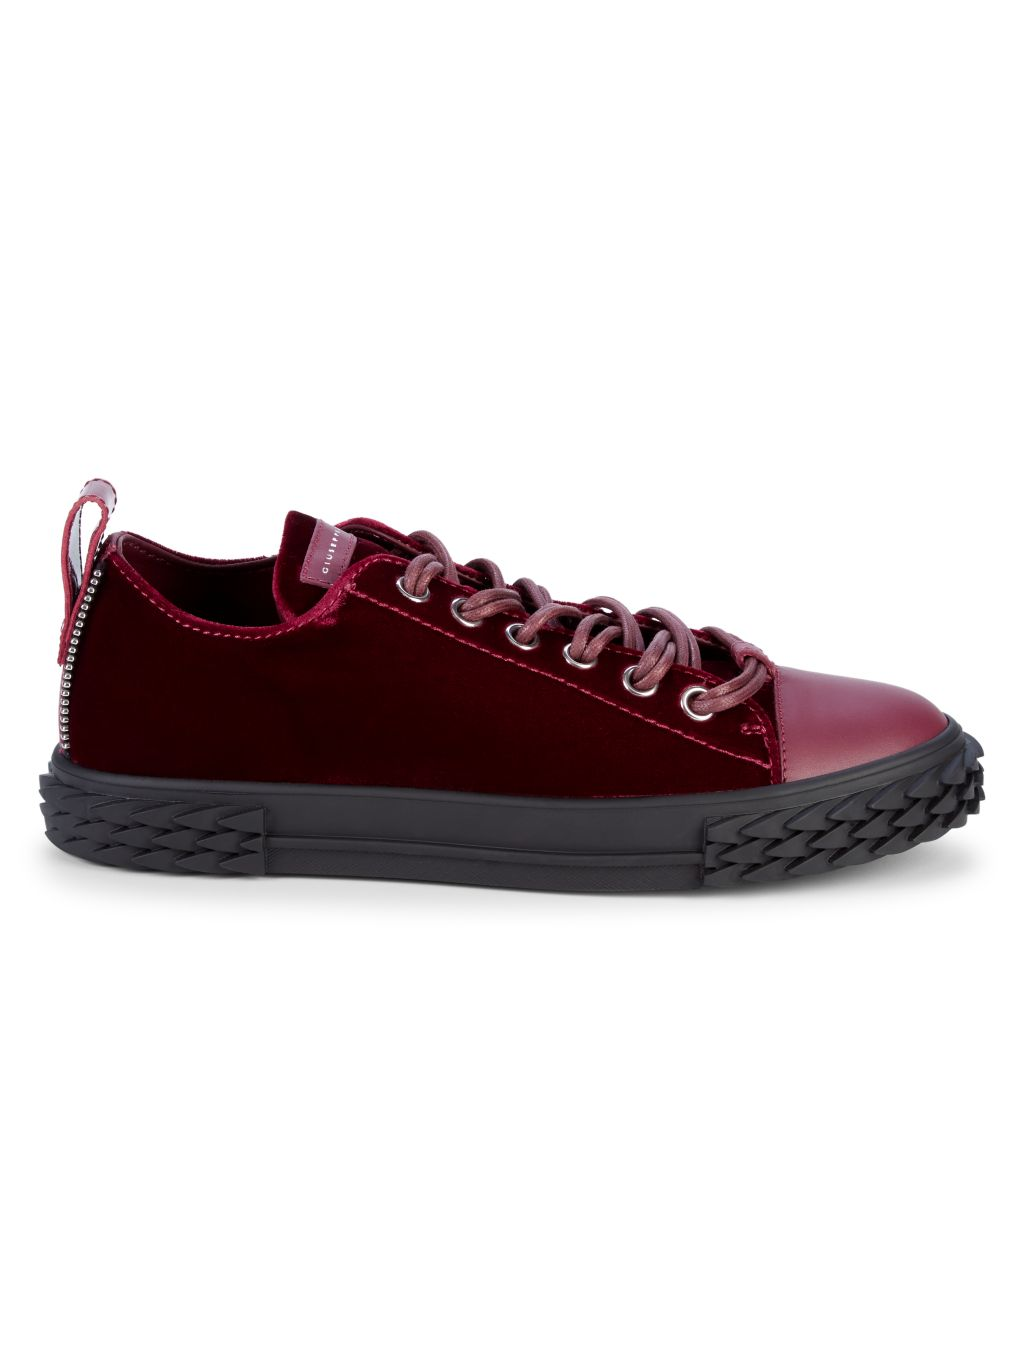 Giuseppe Zanotti Velvet & Leather Low-Top Sneakers